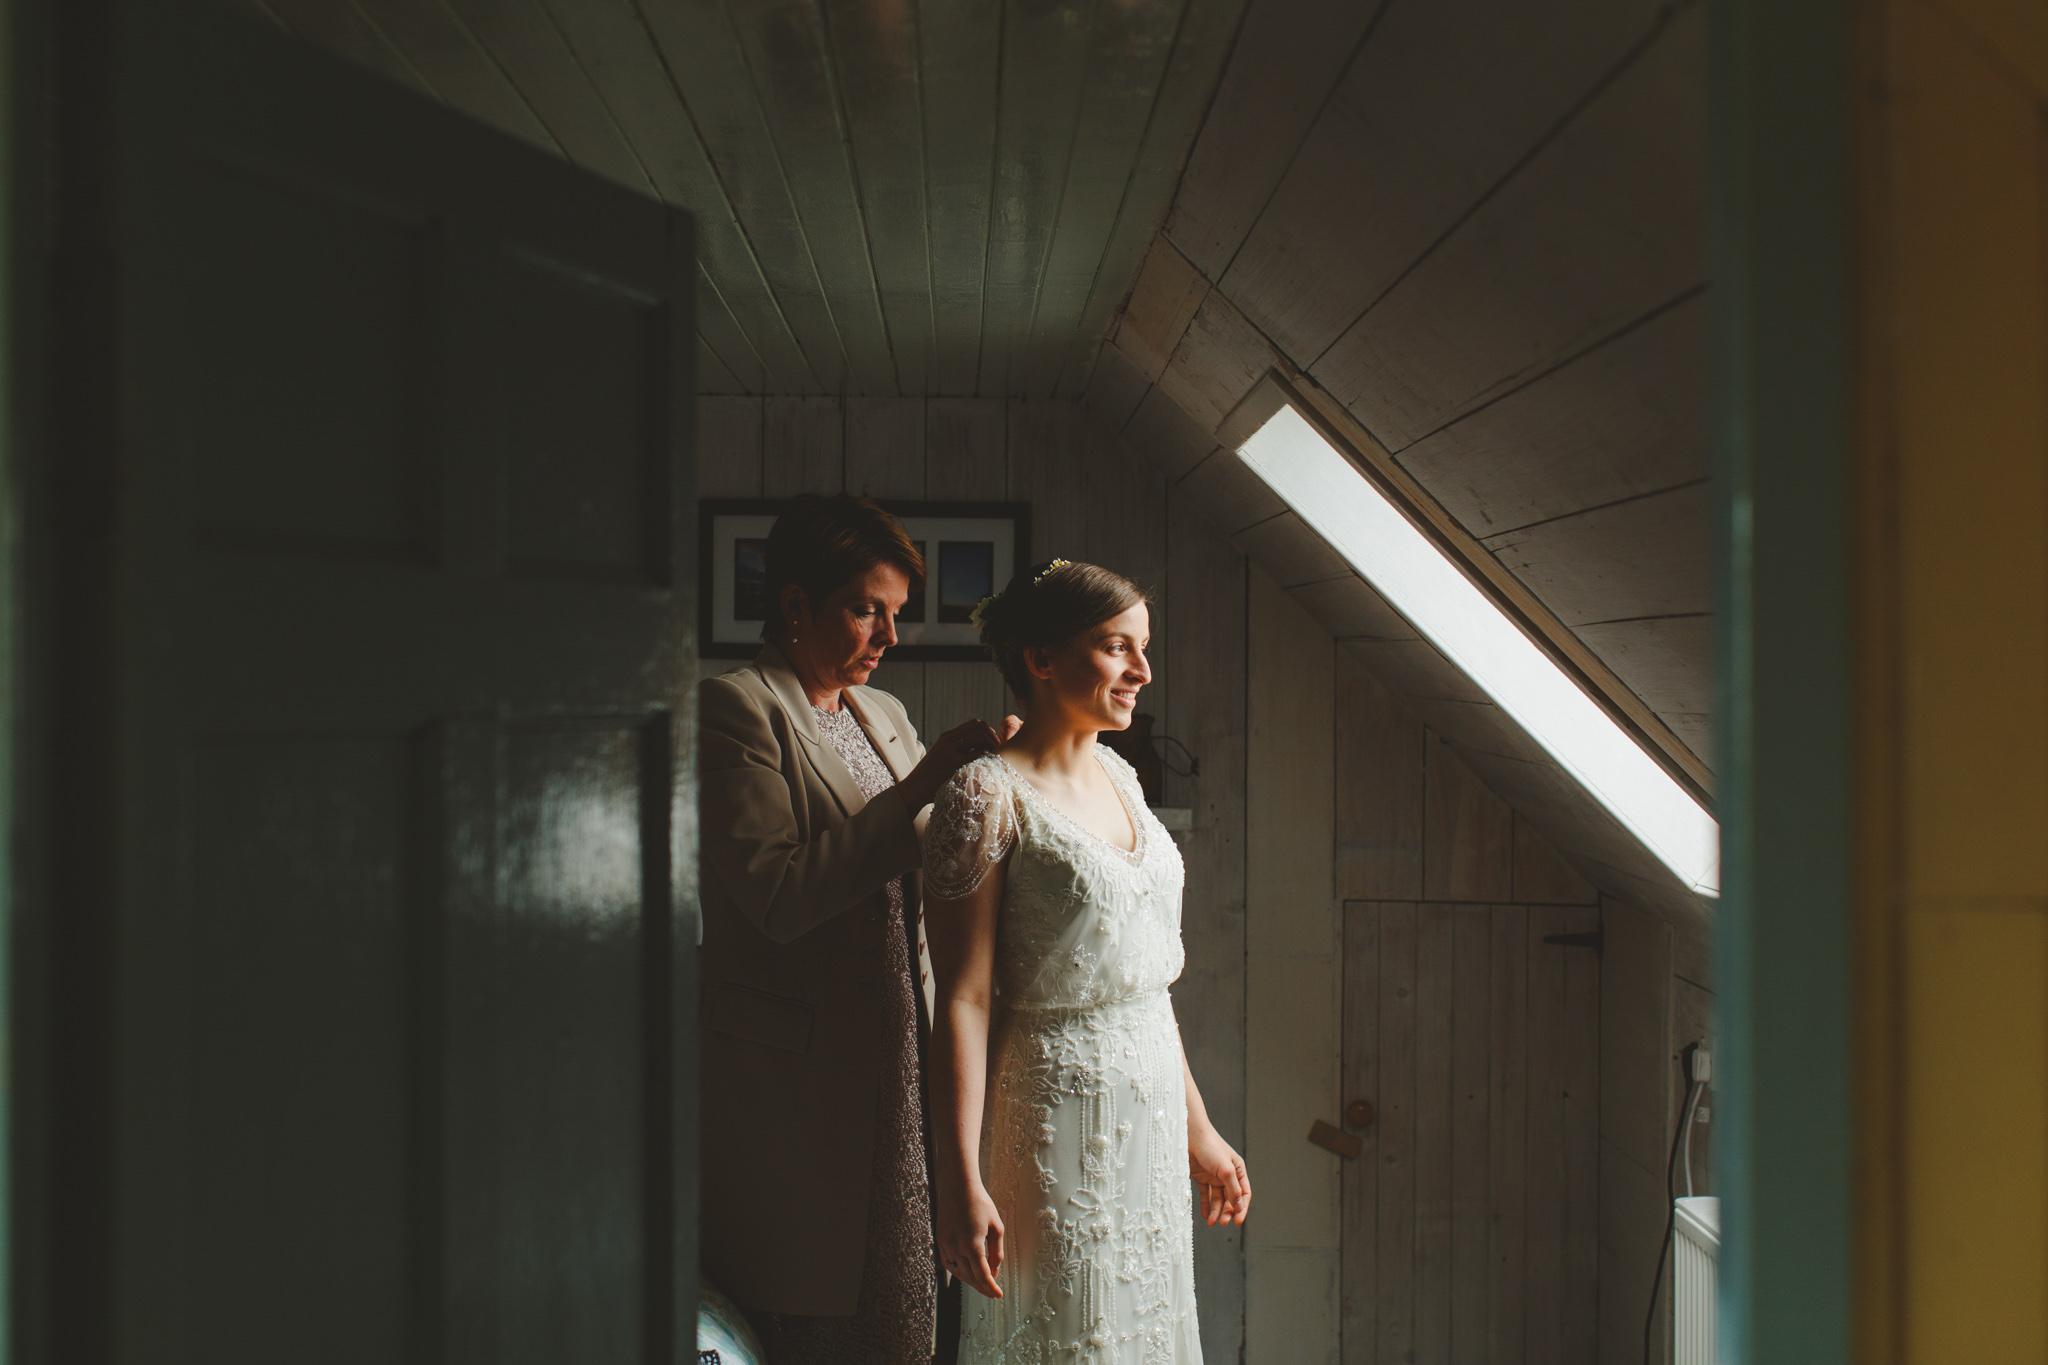 derbyshire-wedding-photographer-videographer-camera-hannah-57.jpg